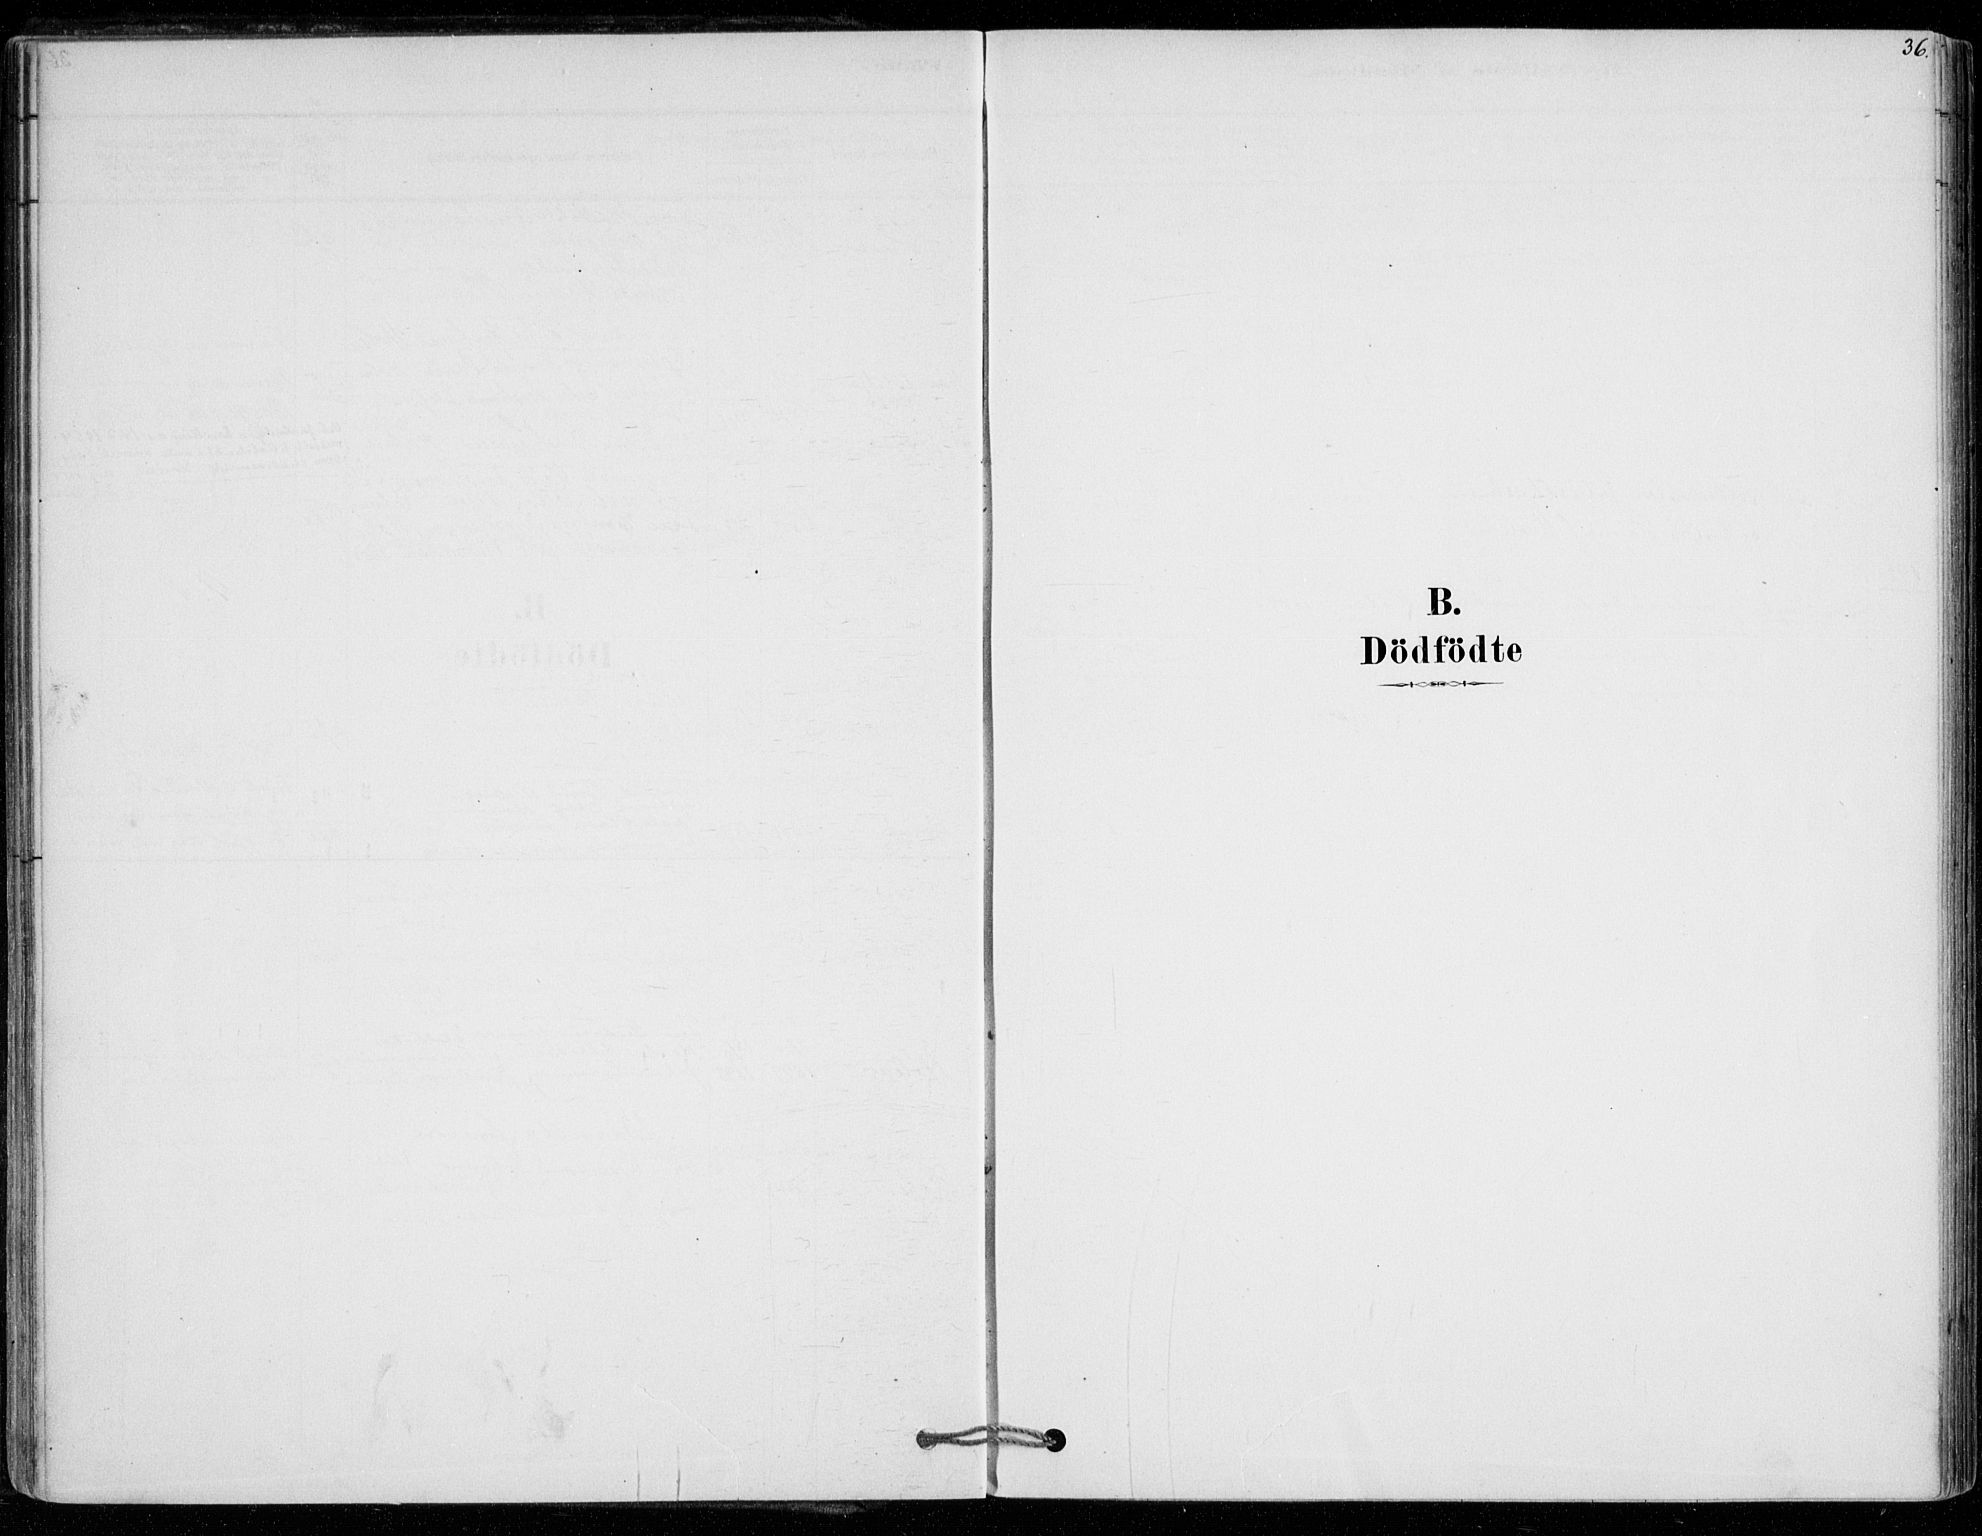 SAO, Vestby prestekontor Kirkebøker, F/Fe/L0001: Ministerialbok nr. V 1, 1878-1931, s. 36